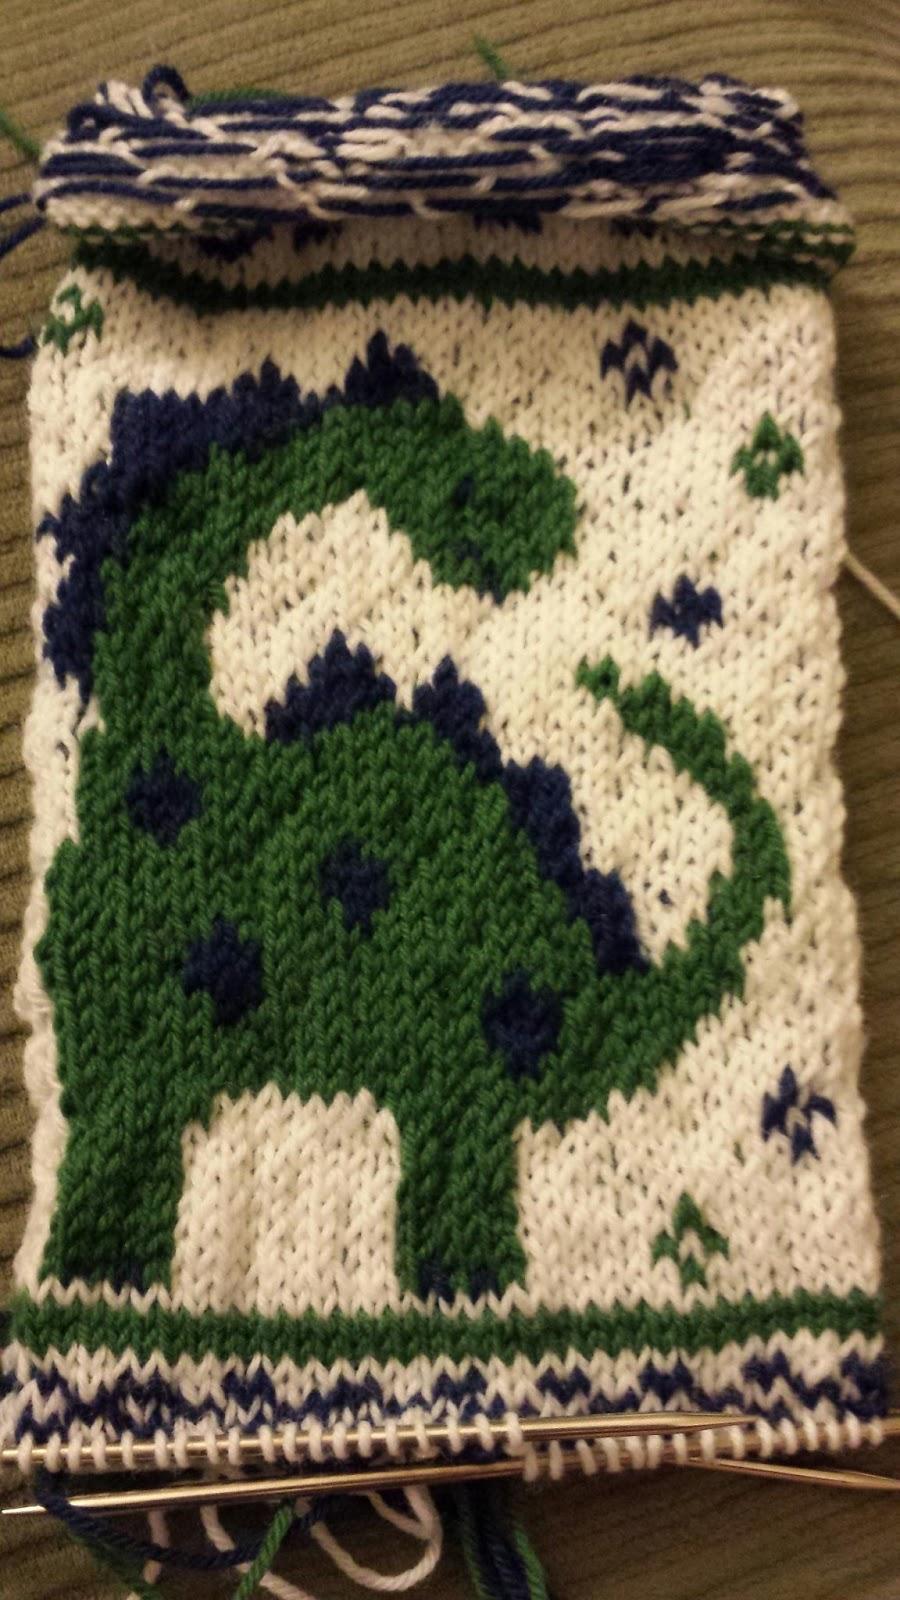 Knitting Pattern For Dinosaur Sweater : ChemKnits: Dinosaur Knitting Chart